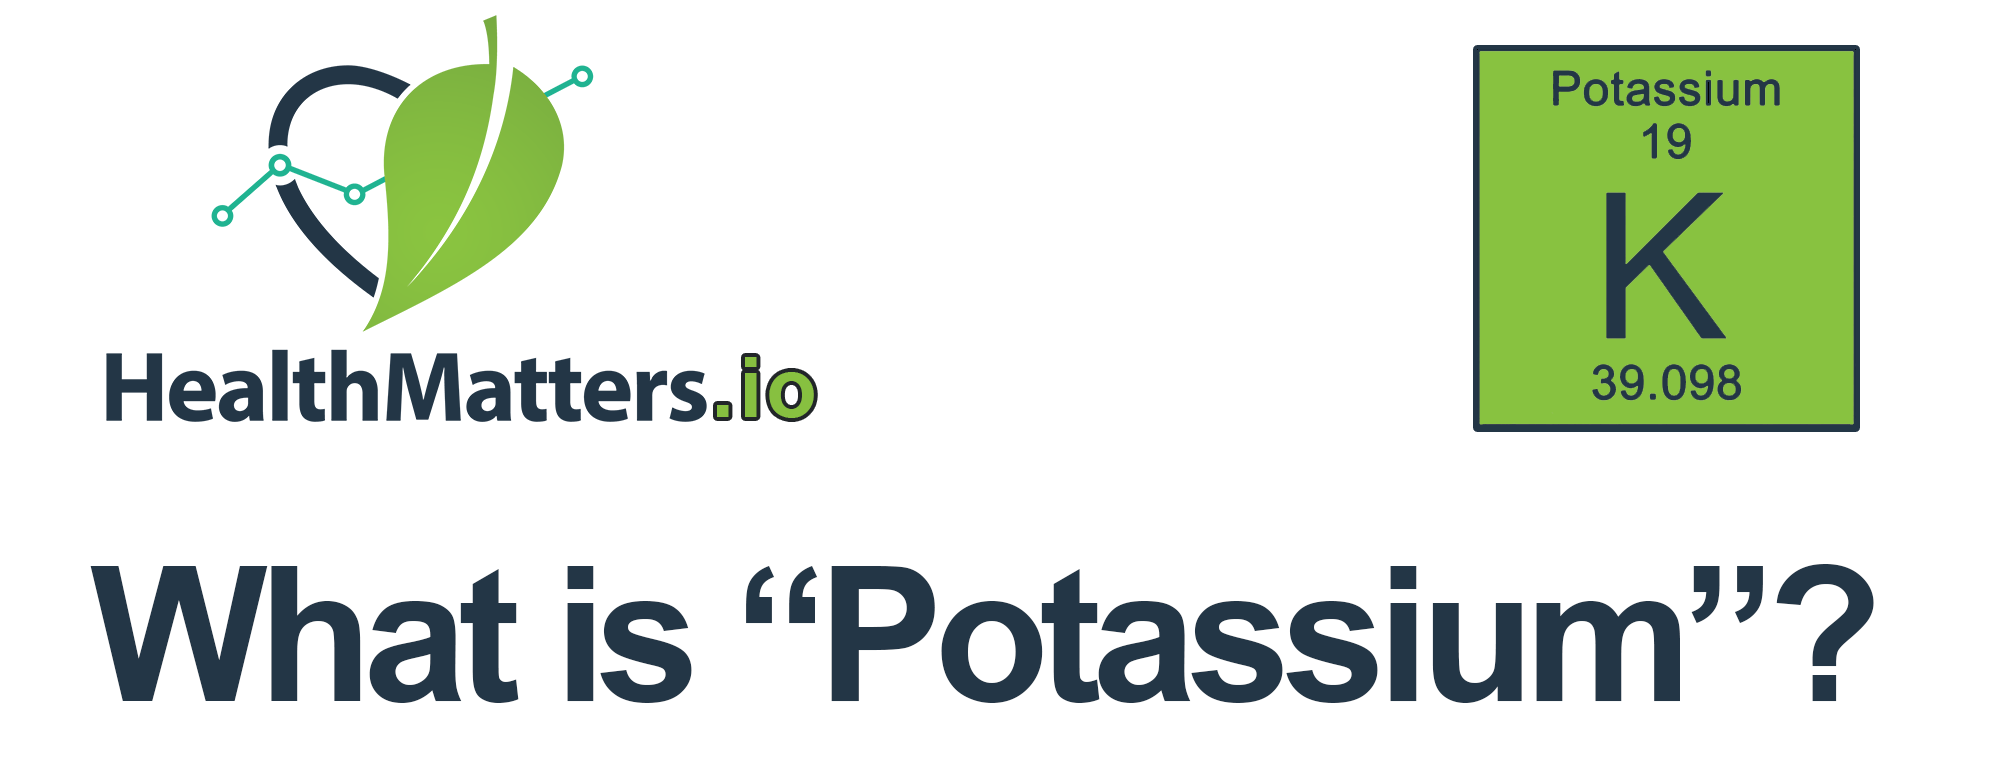 potassium electrolytes healthmatters